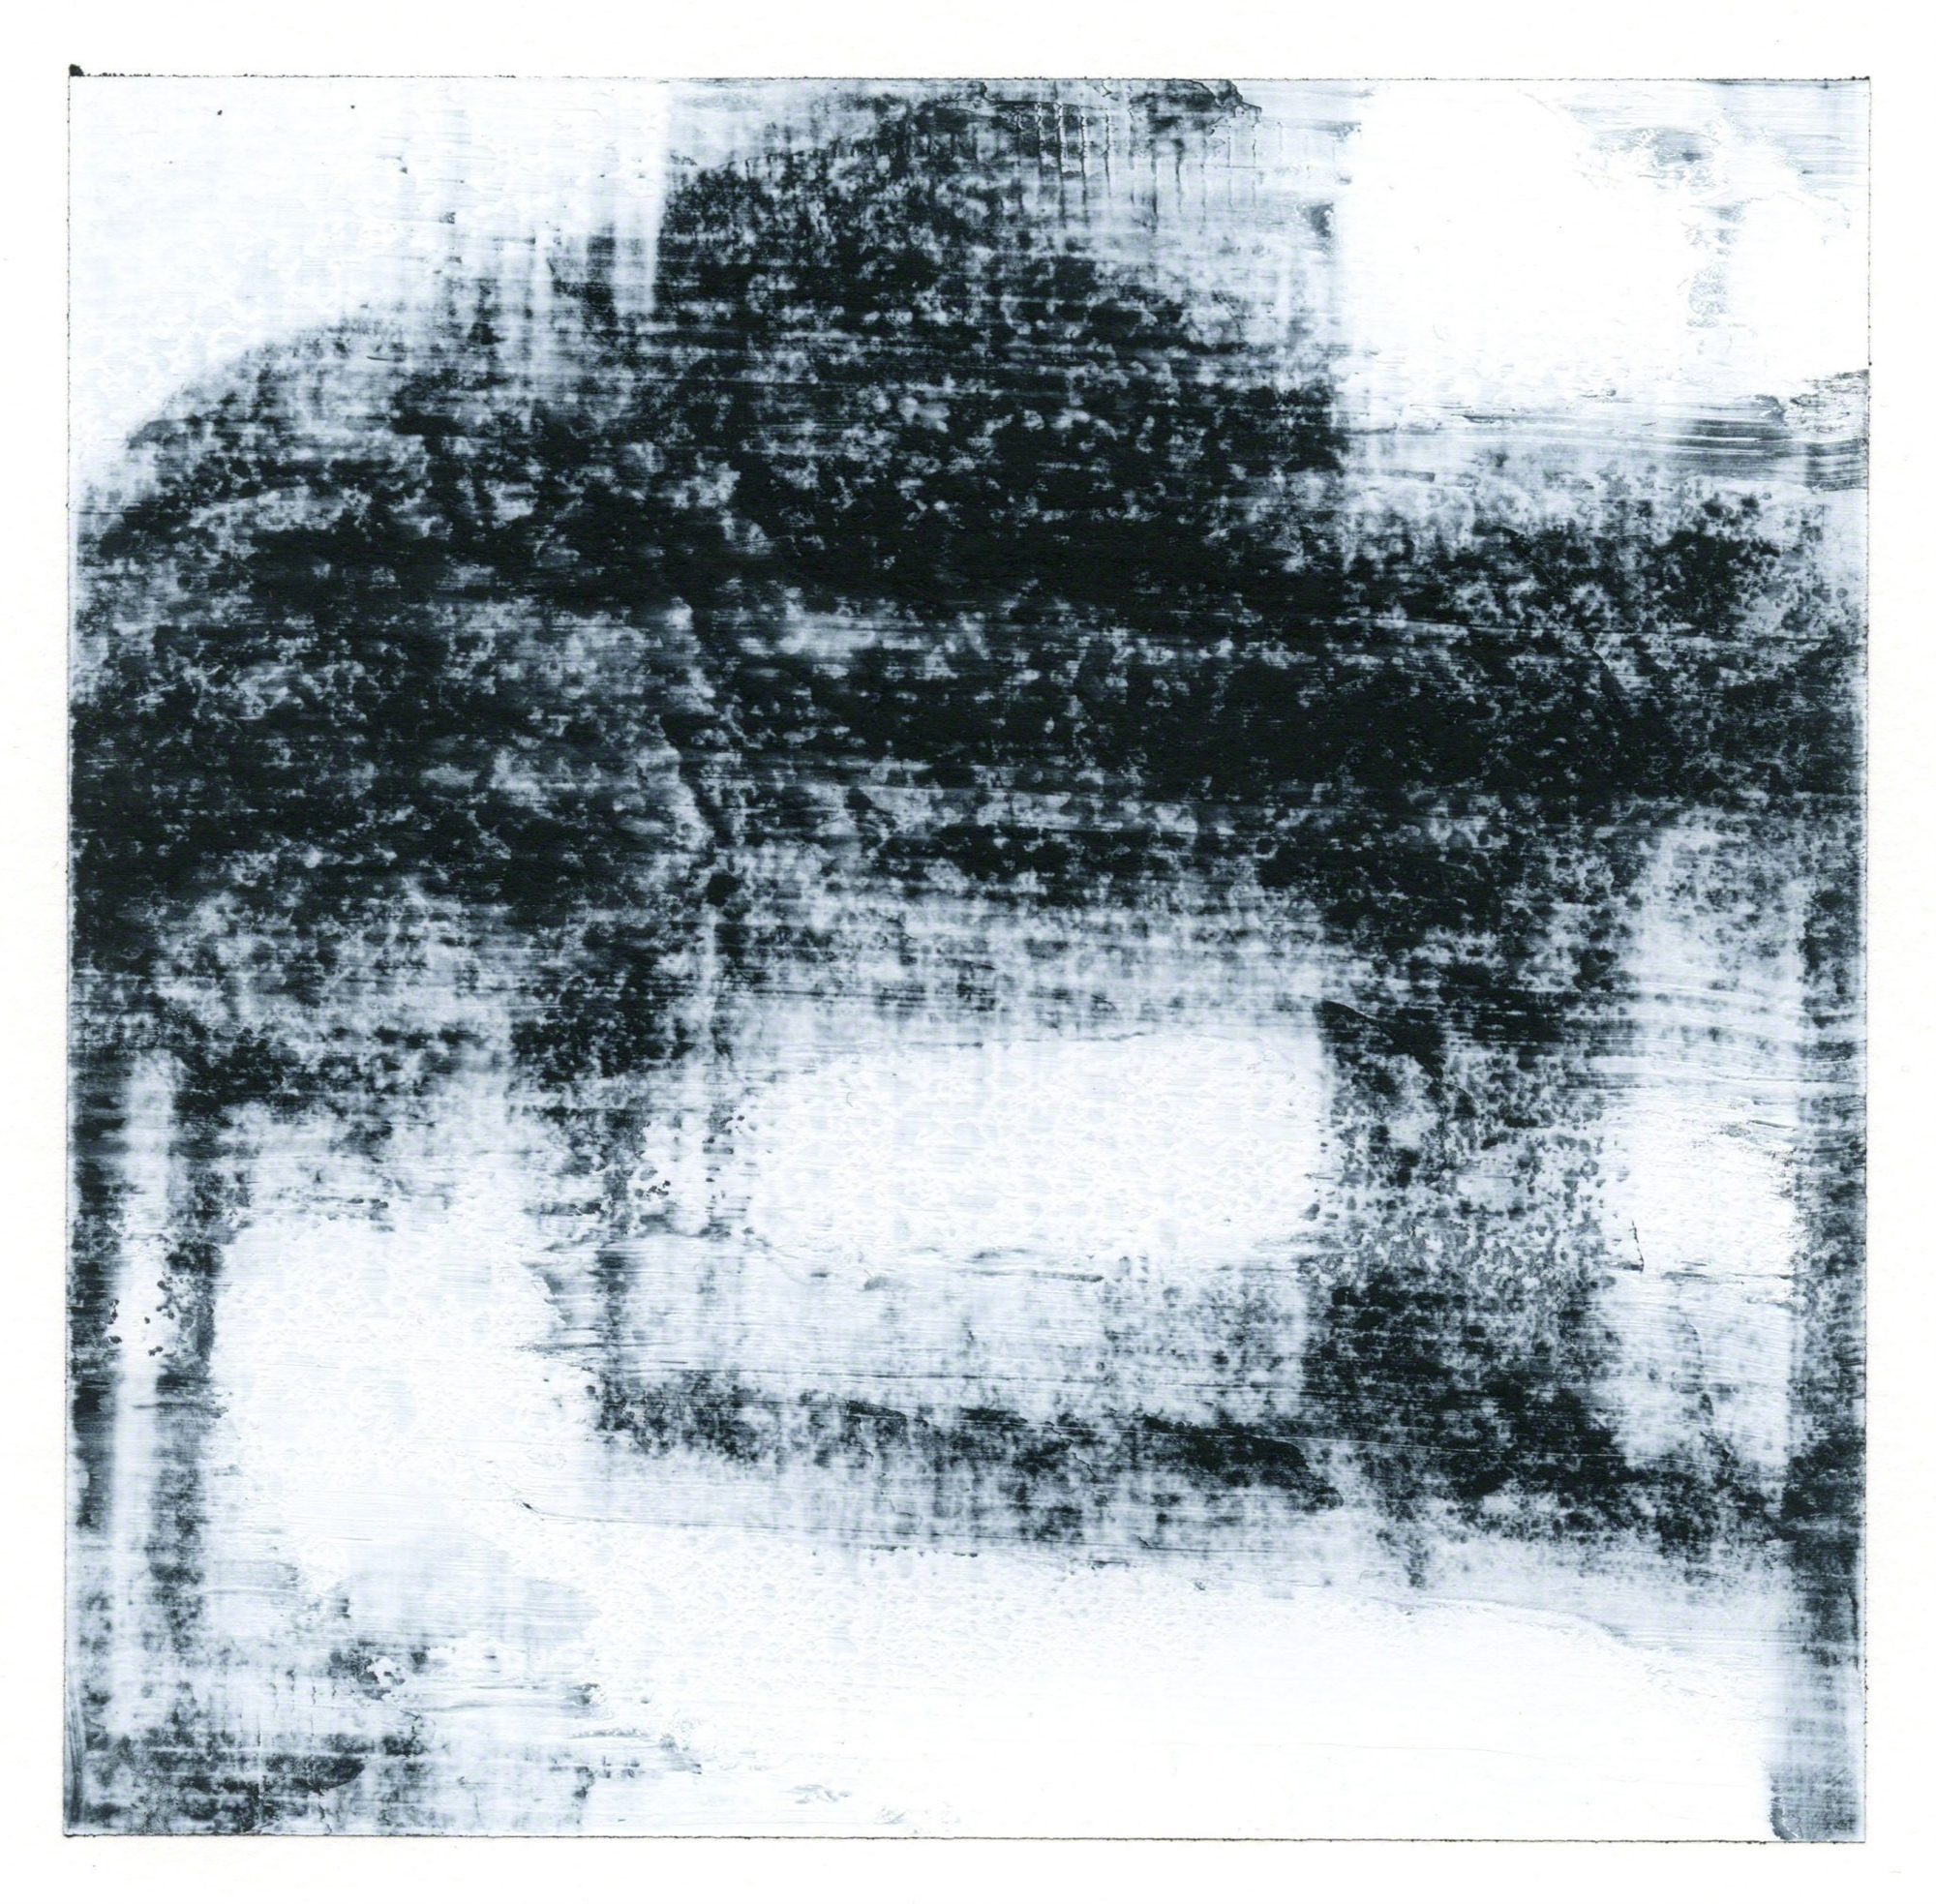 Untitled (18.02.16) by Paul Moran